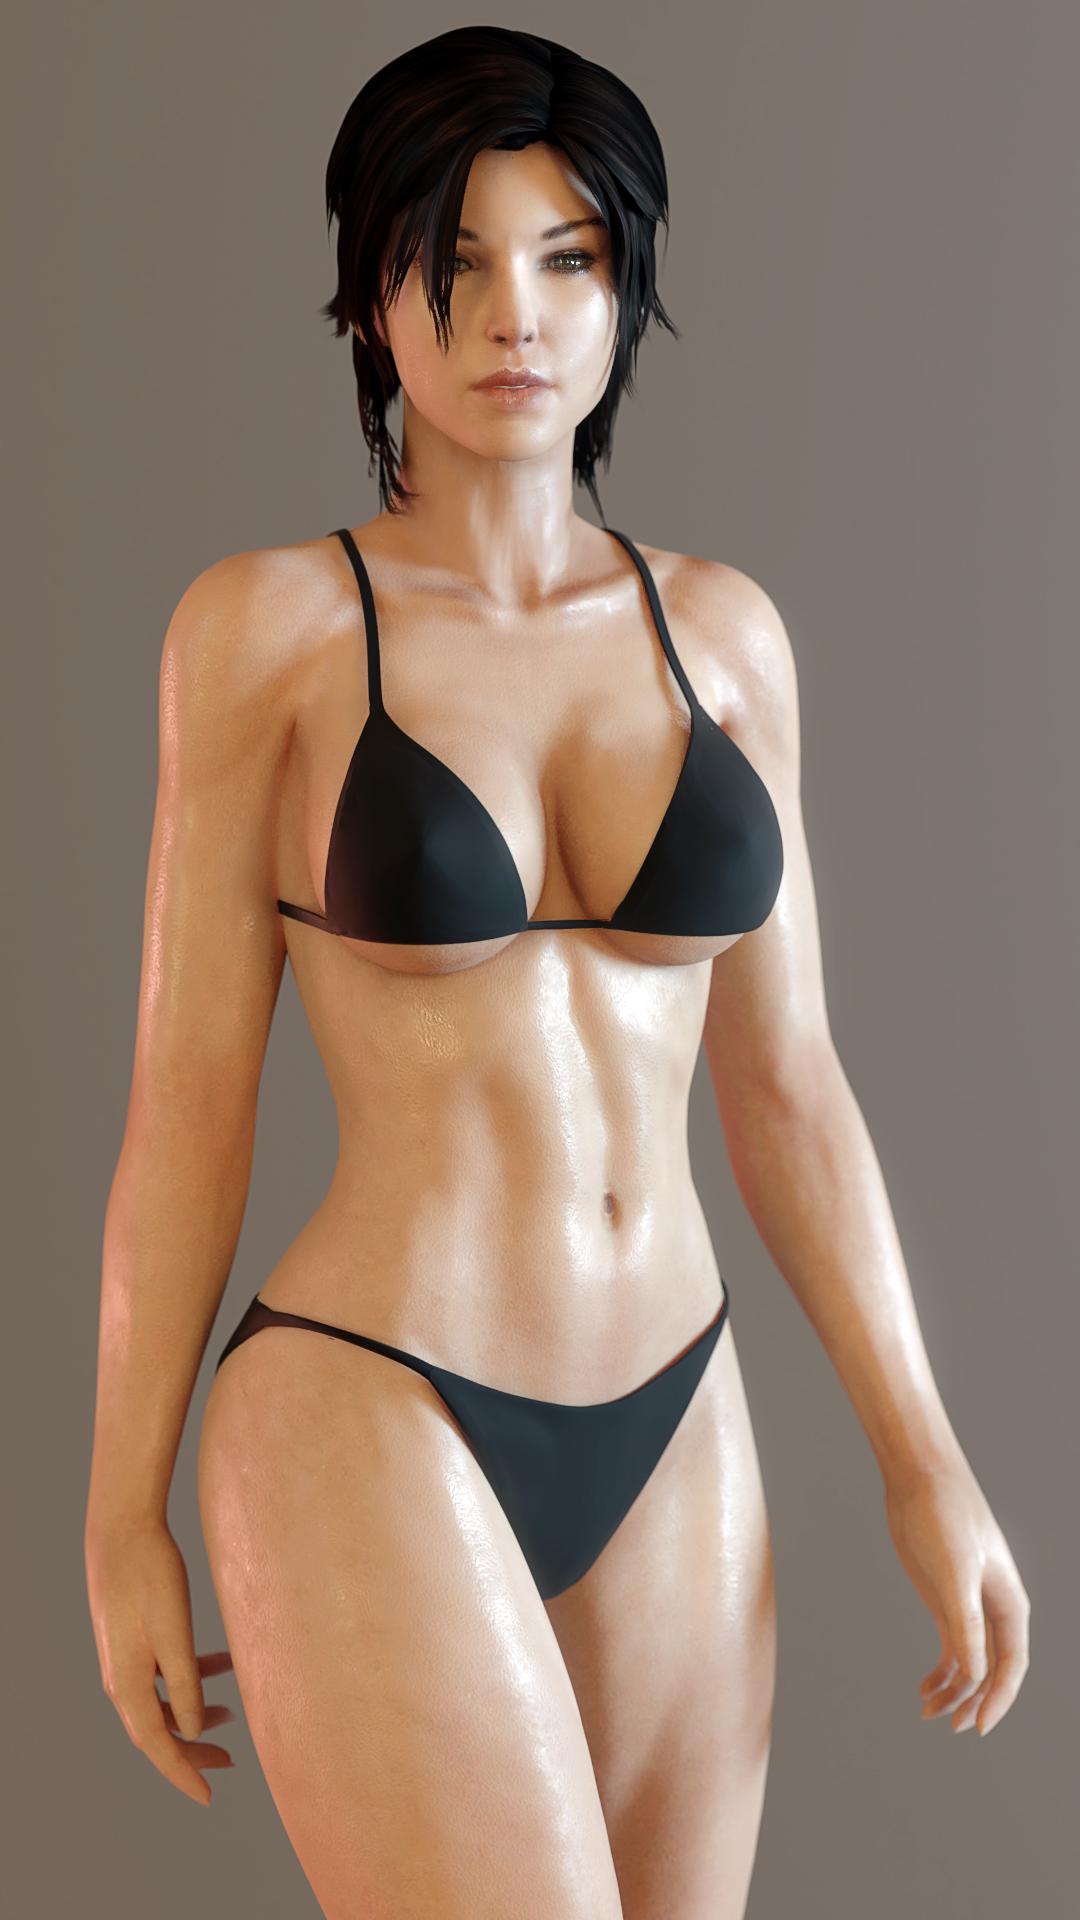 Something Lara croft in bikini pictures